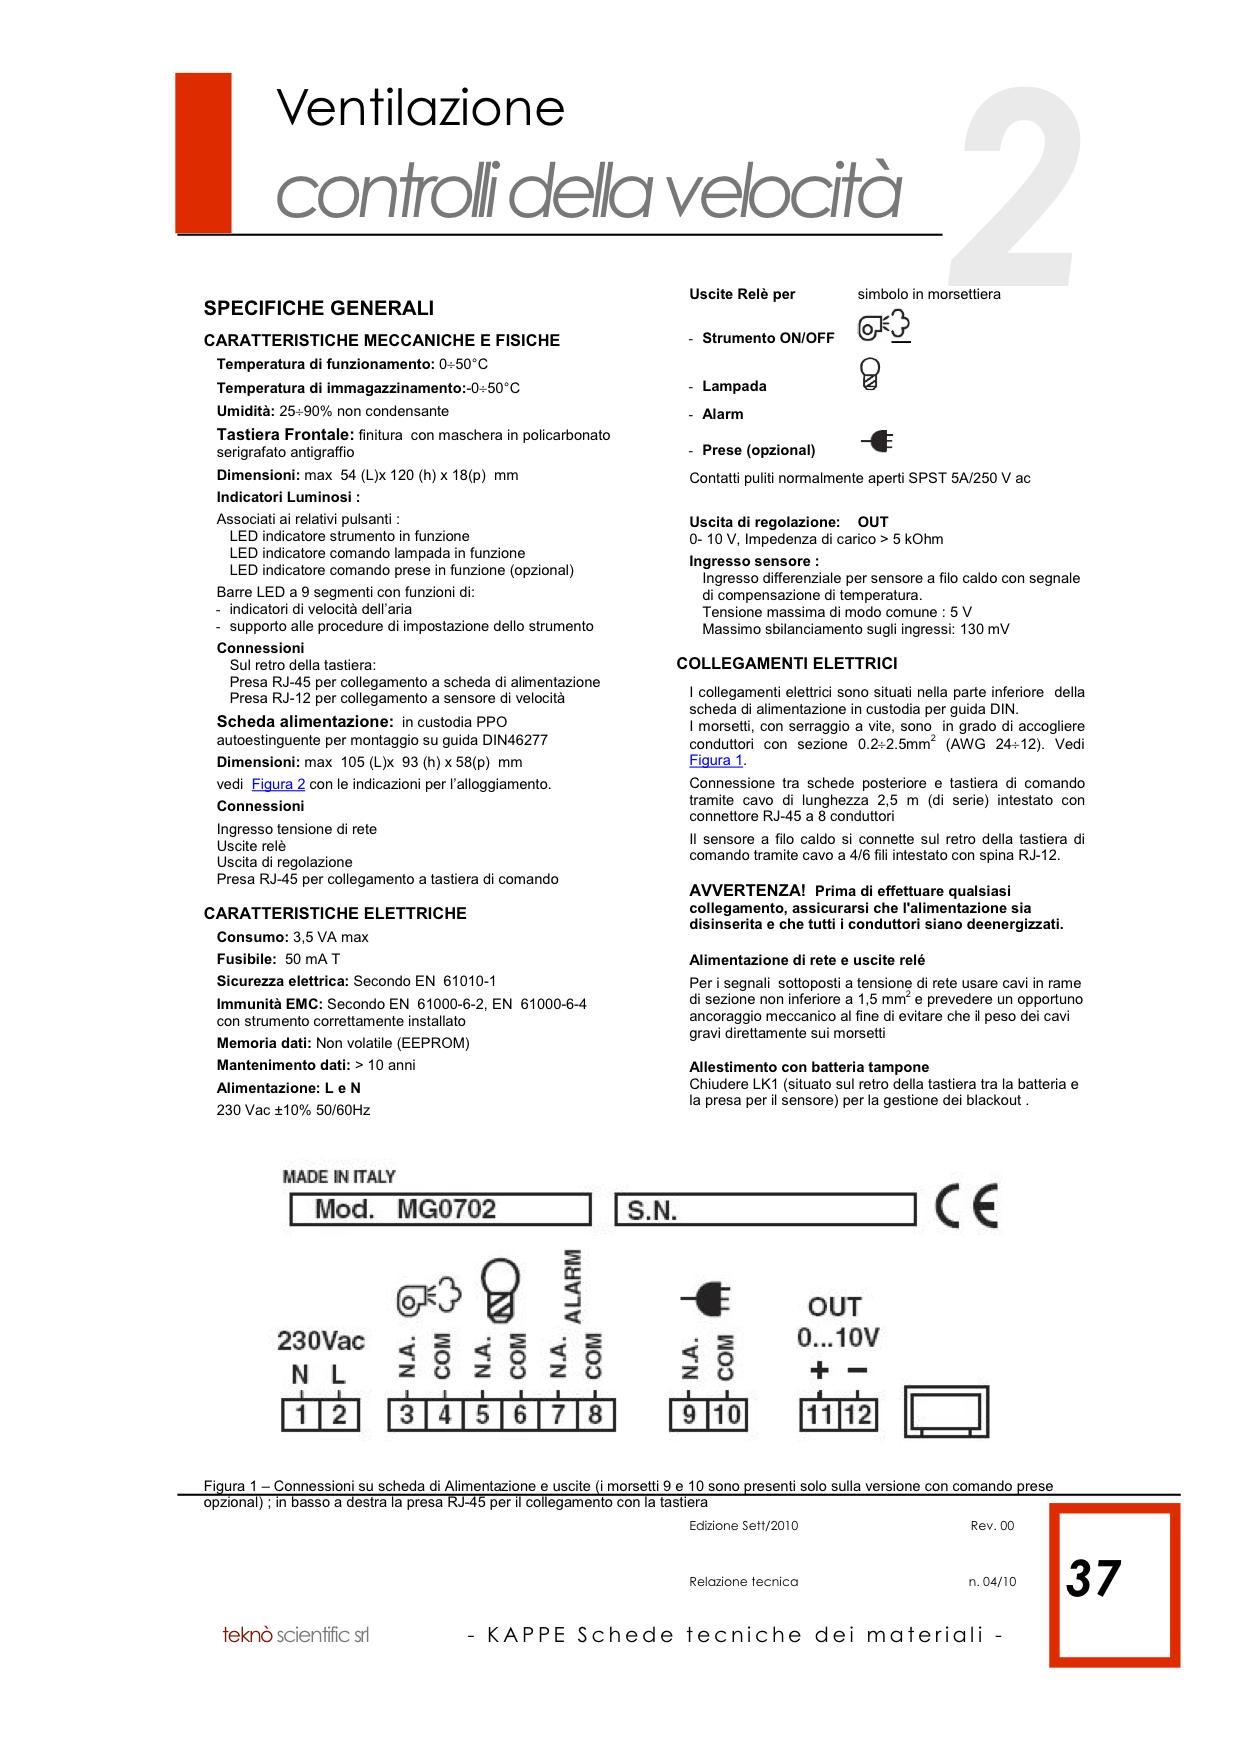 KAPPE Schede tecniche materiali copia 17.png